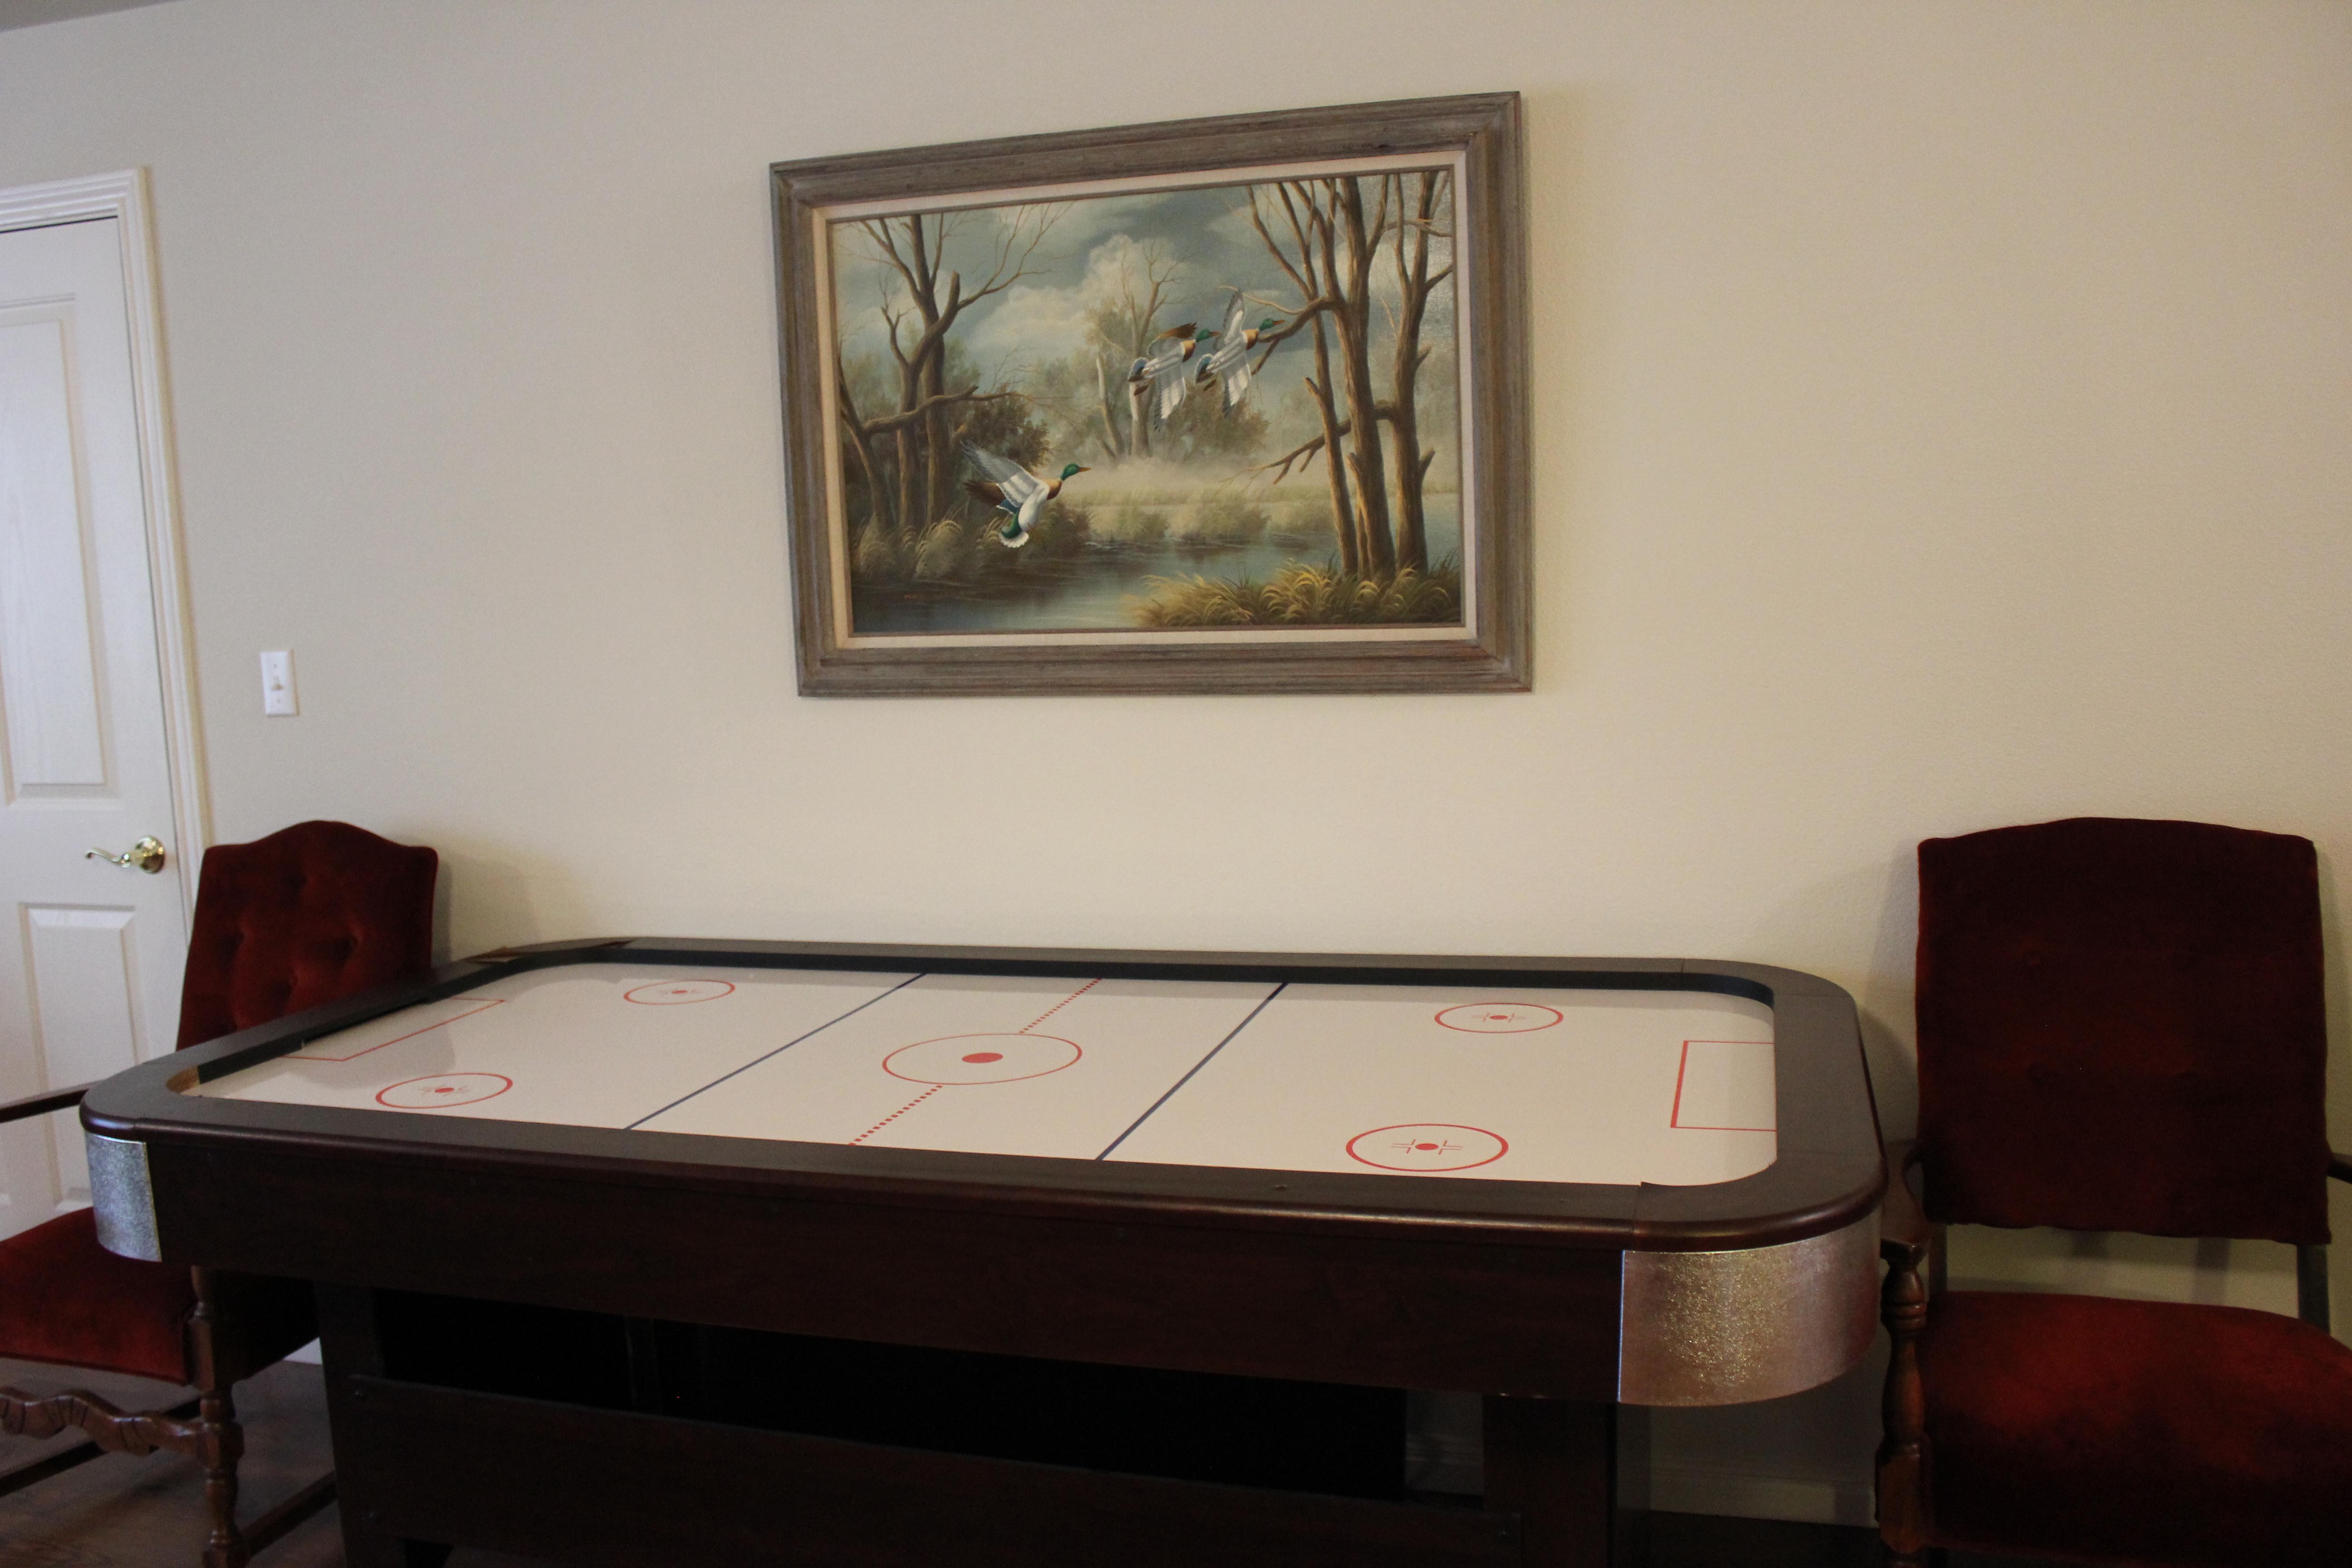 Hawk's Nest Hockey Table